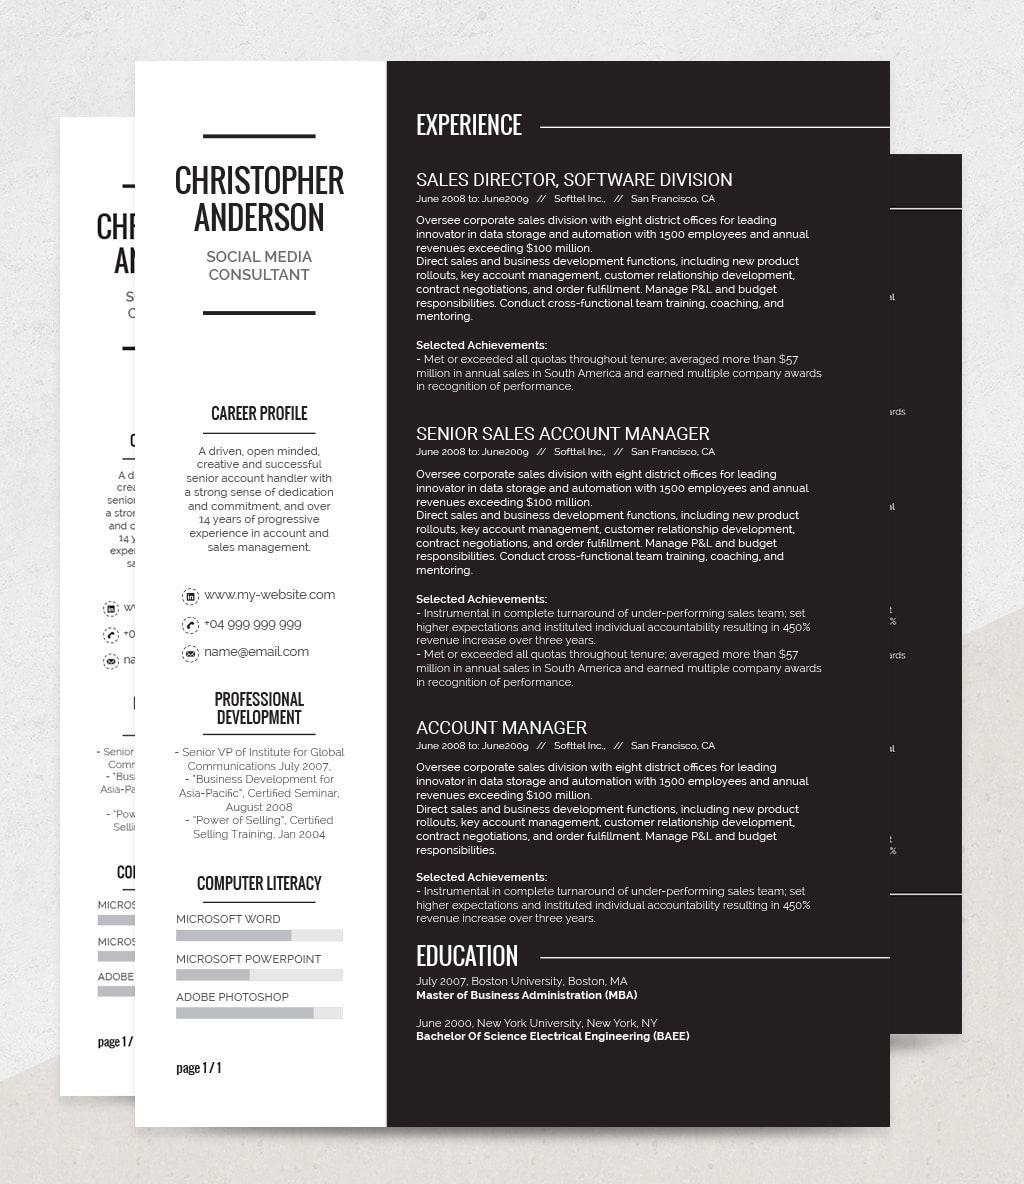 Resume Templates Resume templates, Resume, Templates